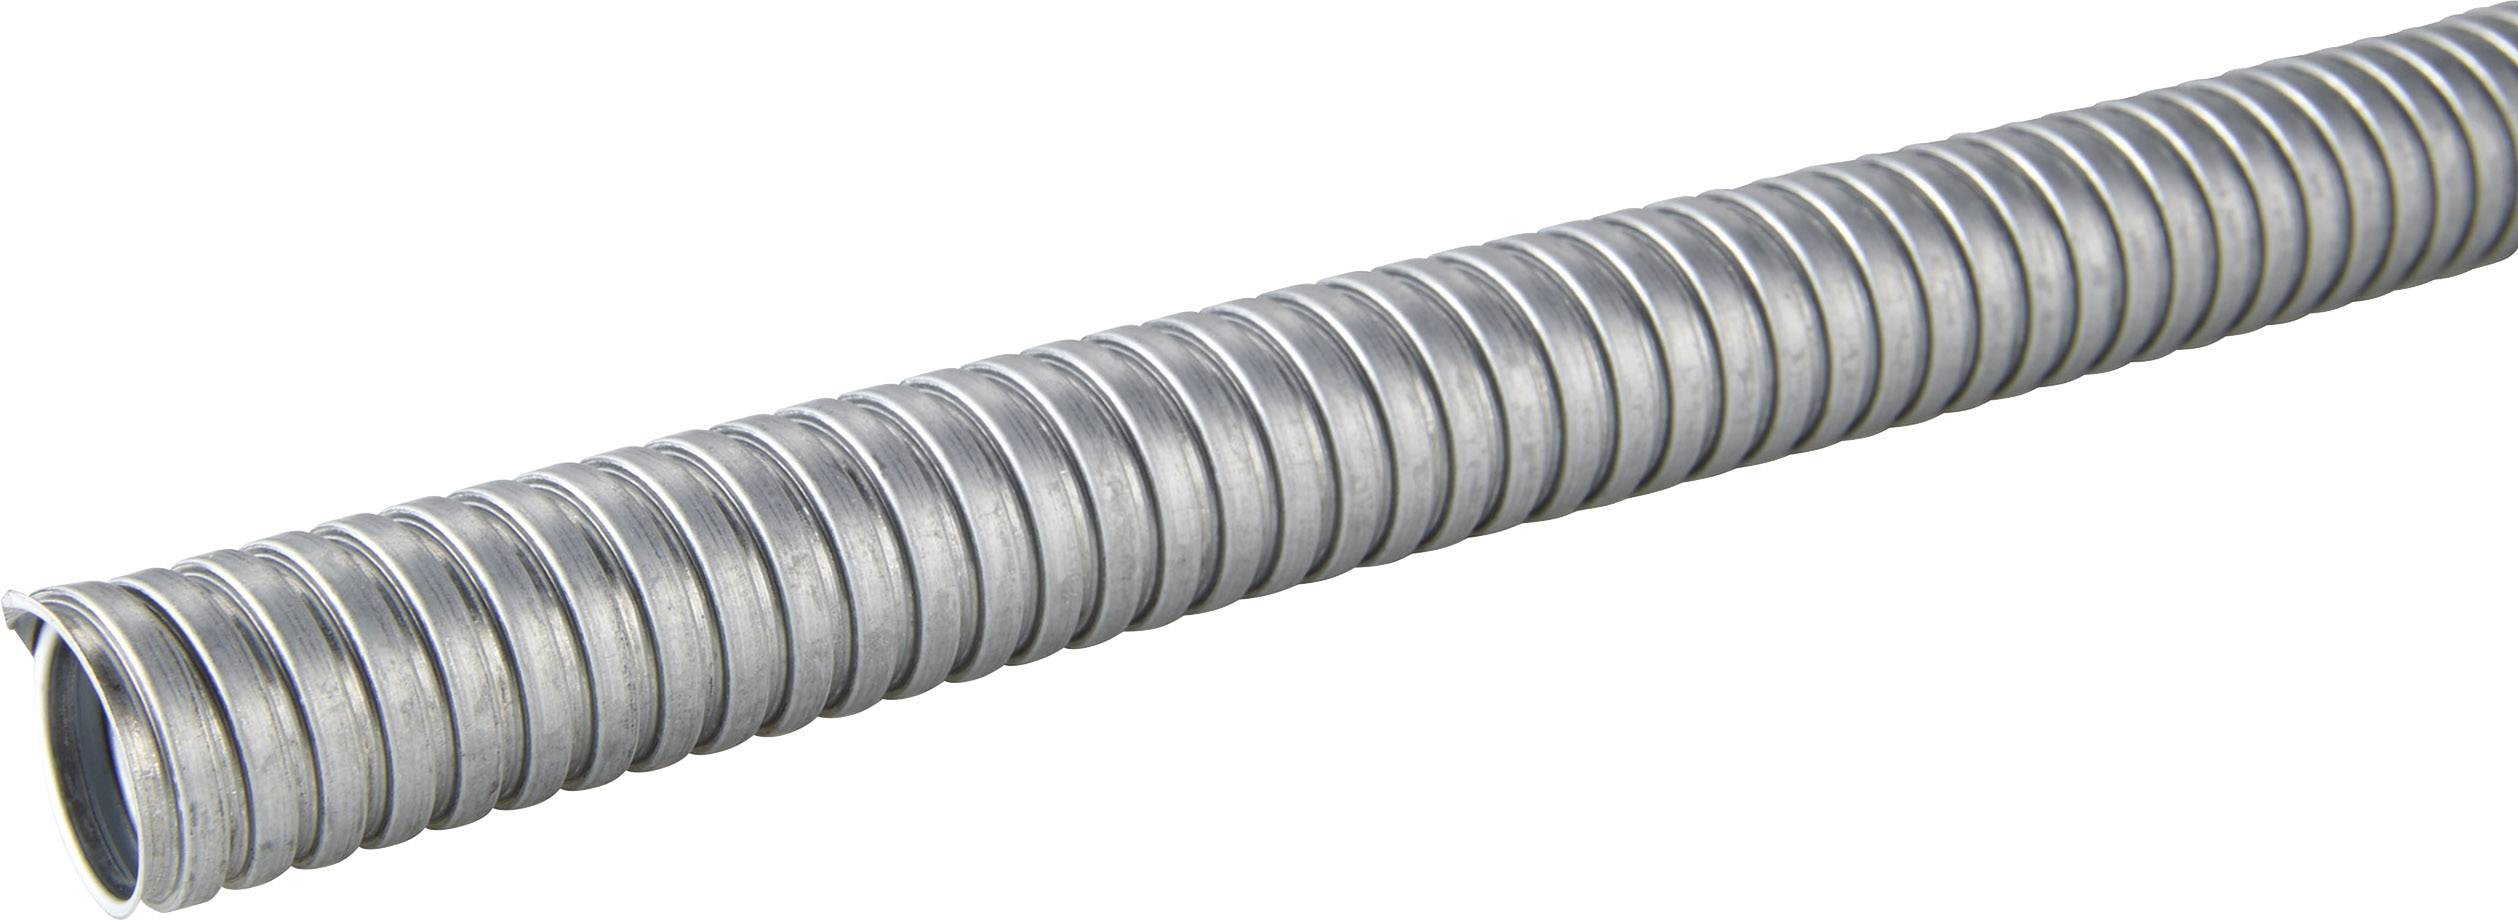 Ochranná hadice na kov LAPP SILVYN® AS 16/18x21 61802120, stříbrná, 50 m